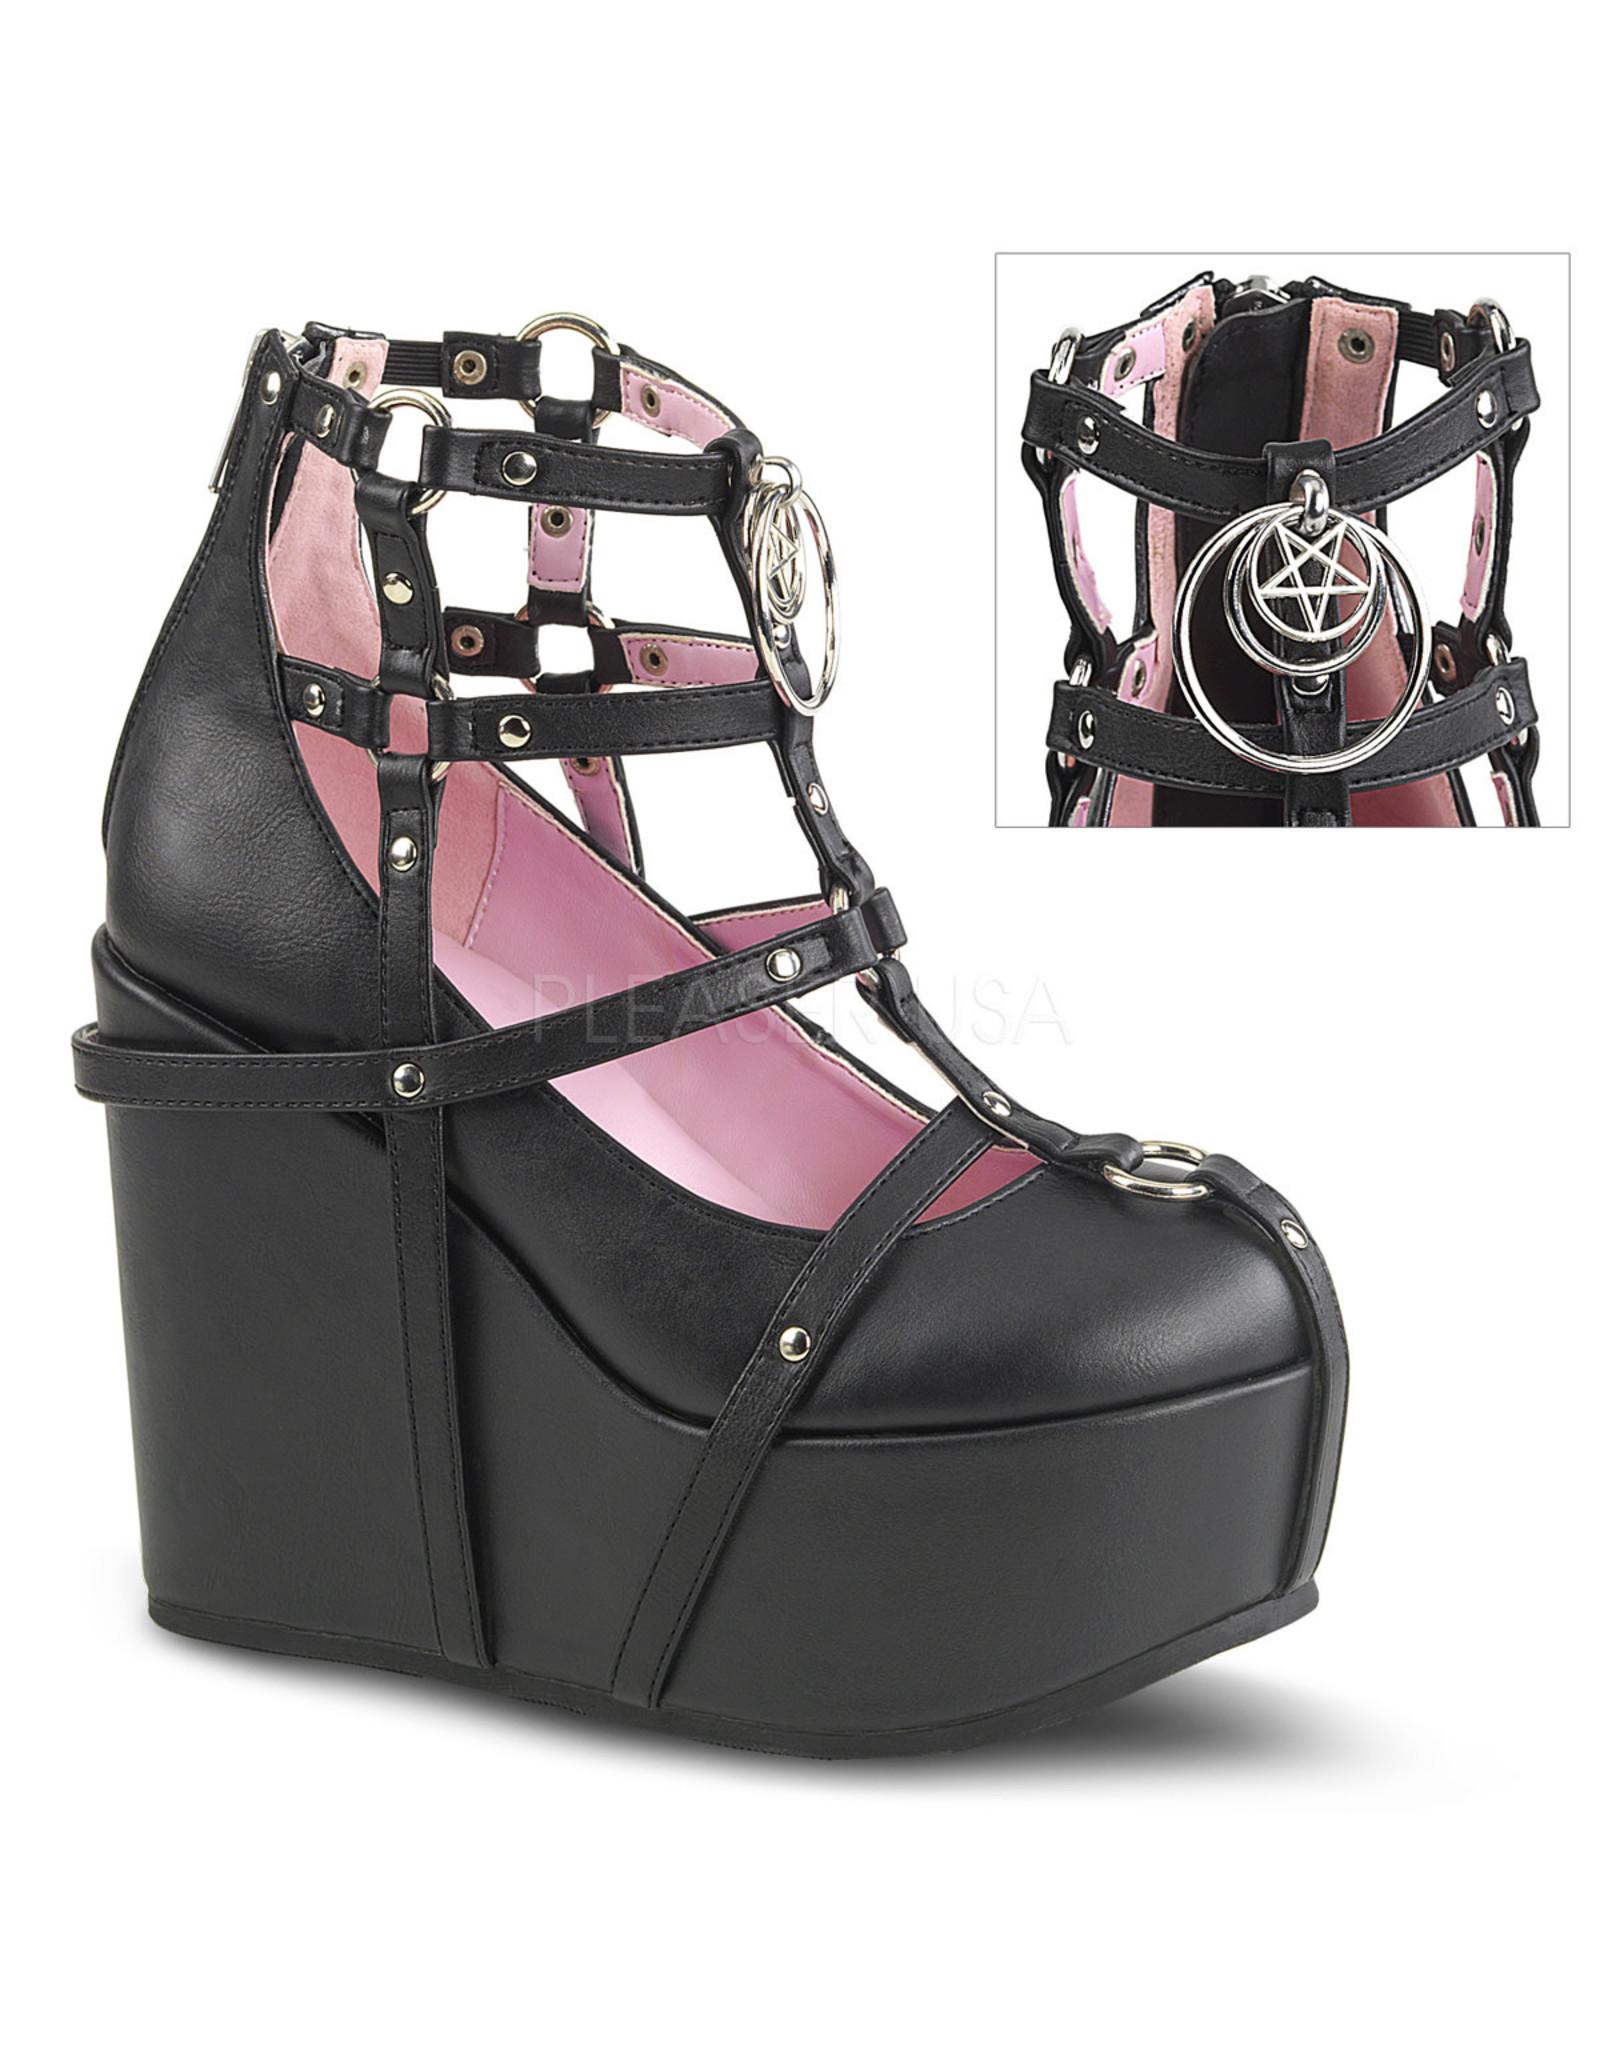 "DEMONIA POISON-25-1 5"" Wedge Platform Black Vegan Leather Cage Bootie + Studding, Multi-Sized O-Rings & Pentagram Charm D34BVC"